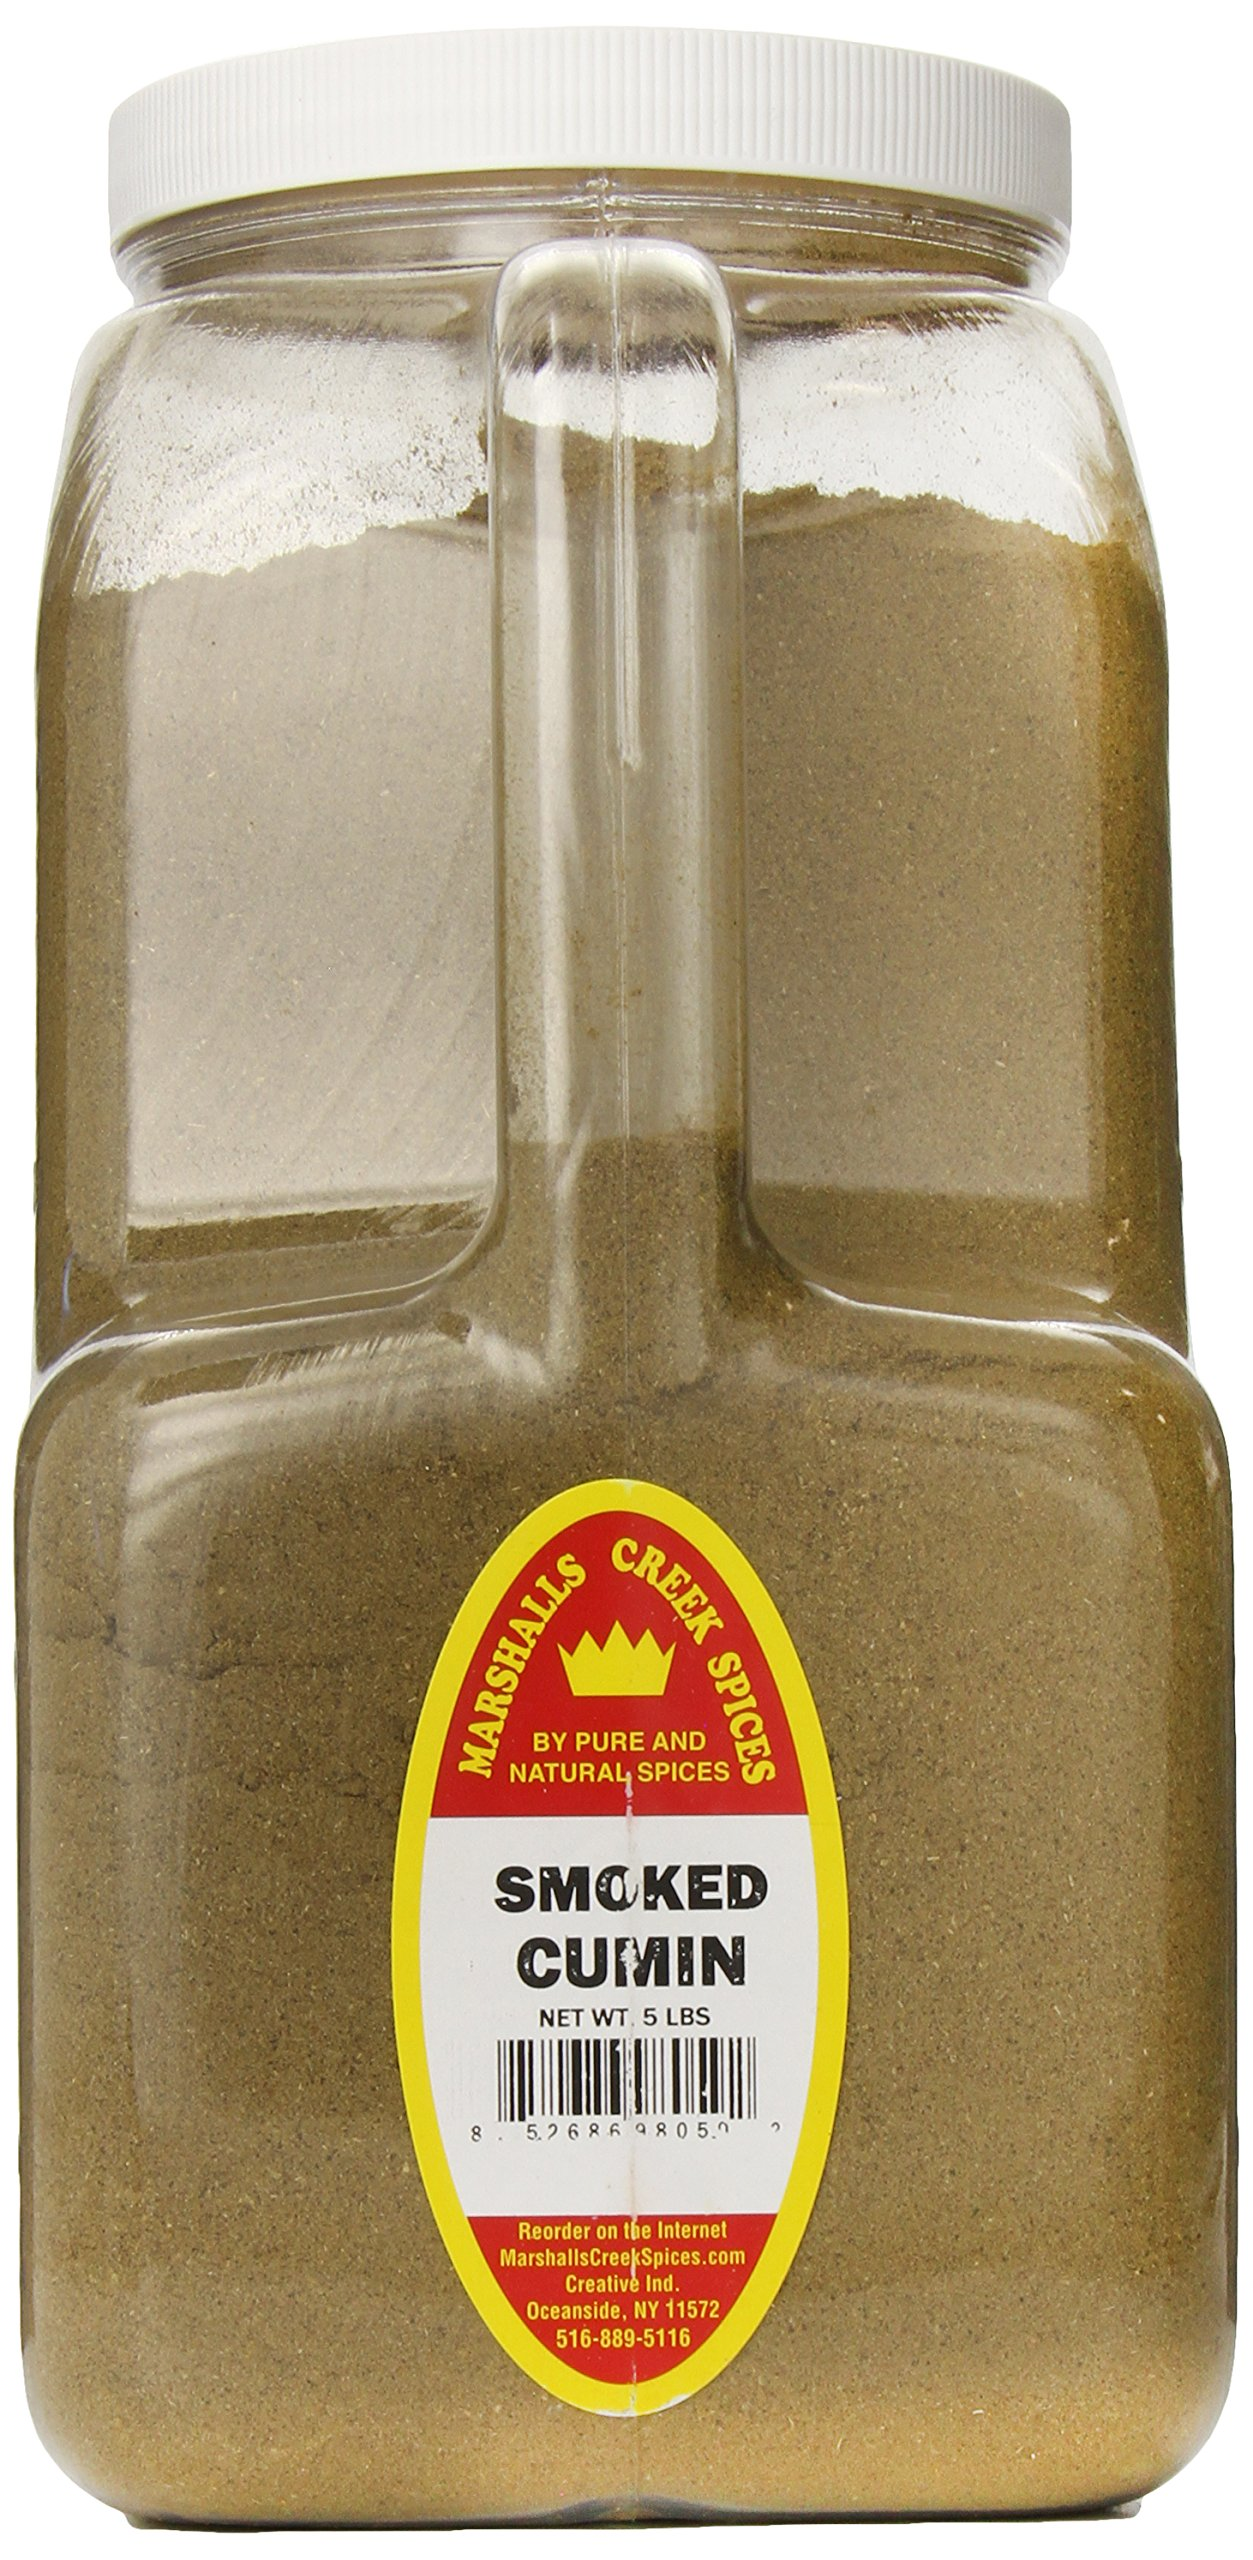 Marshalls Creek Spices XXL Restaurant Size Spice Jug, Smoked Cumin Ground, 5 Pound